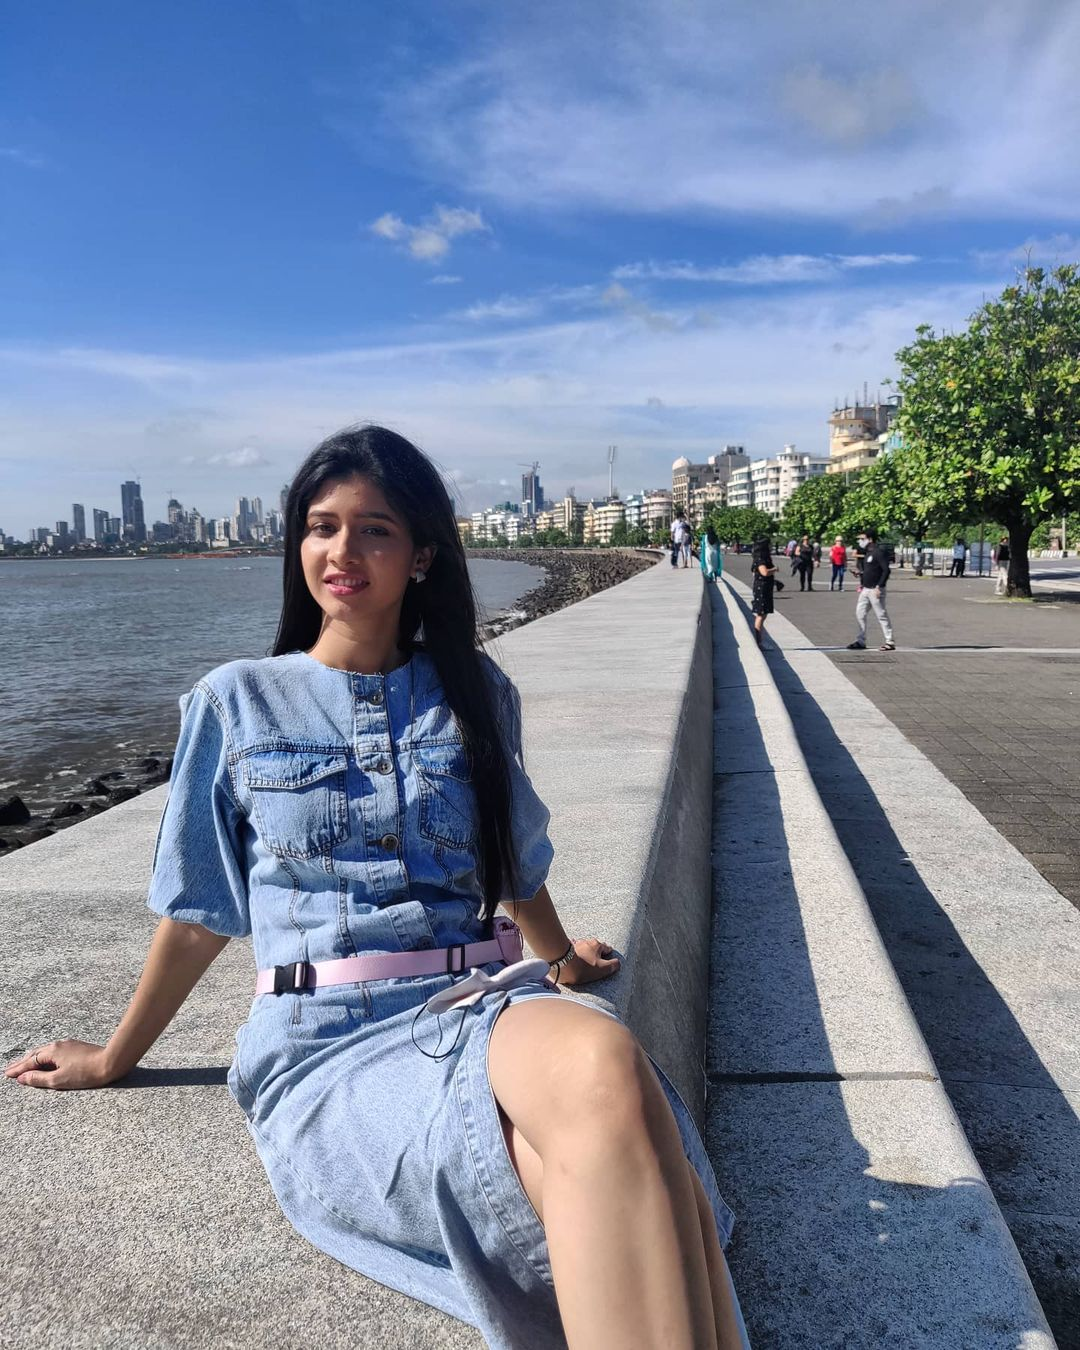 Sheetal Tiwari Instagram, Biography, Net Worth, Age, Career, Body Measurements, Family, Boyfriend, Twitter, Education, and Success Story